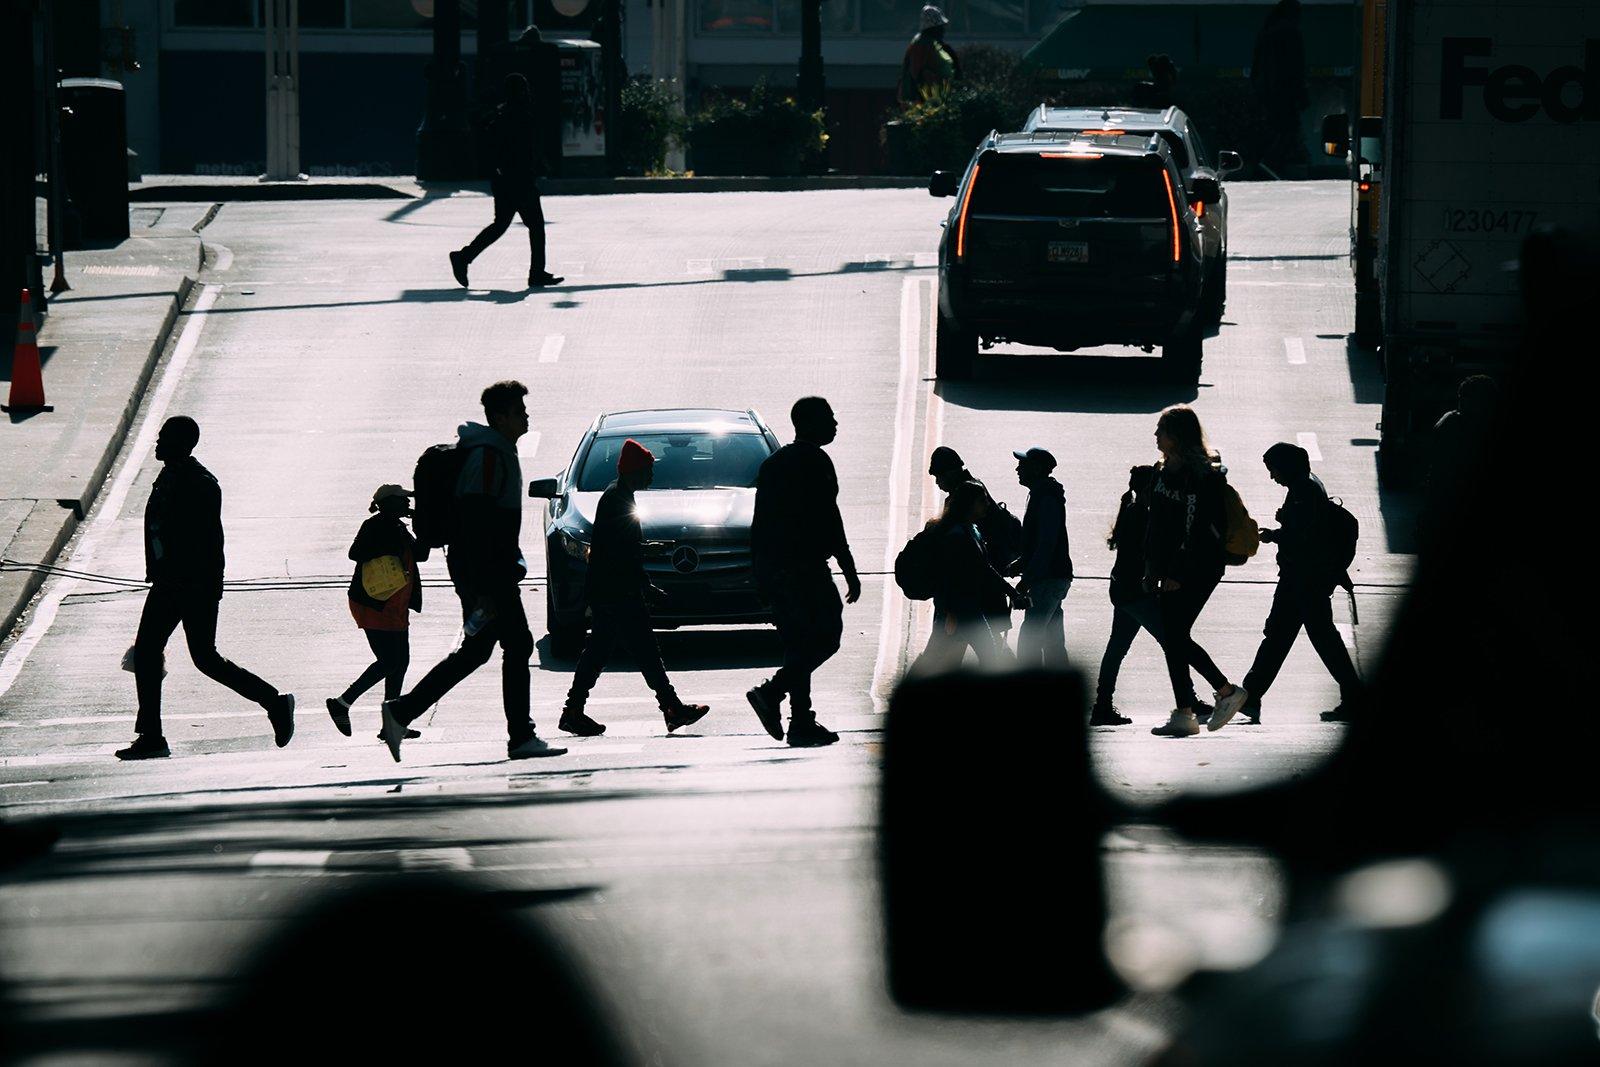 usando lente de 200-600 en fotografía urbana